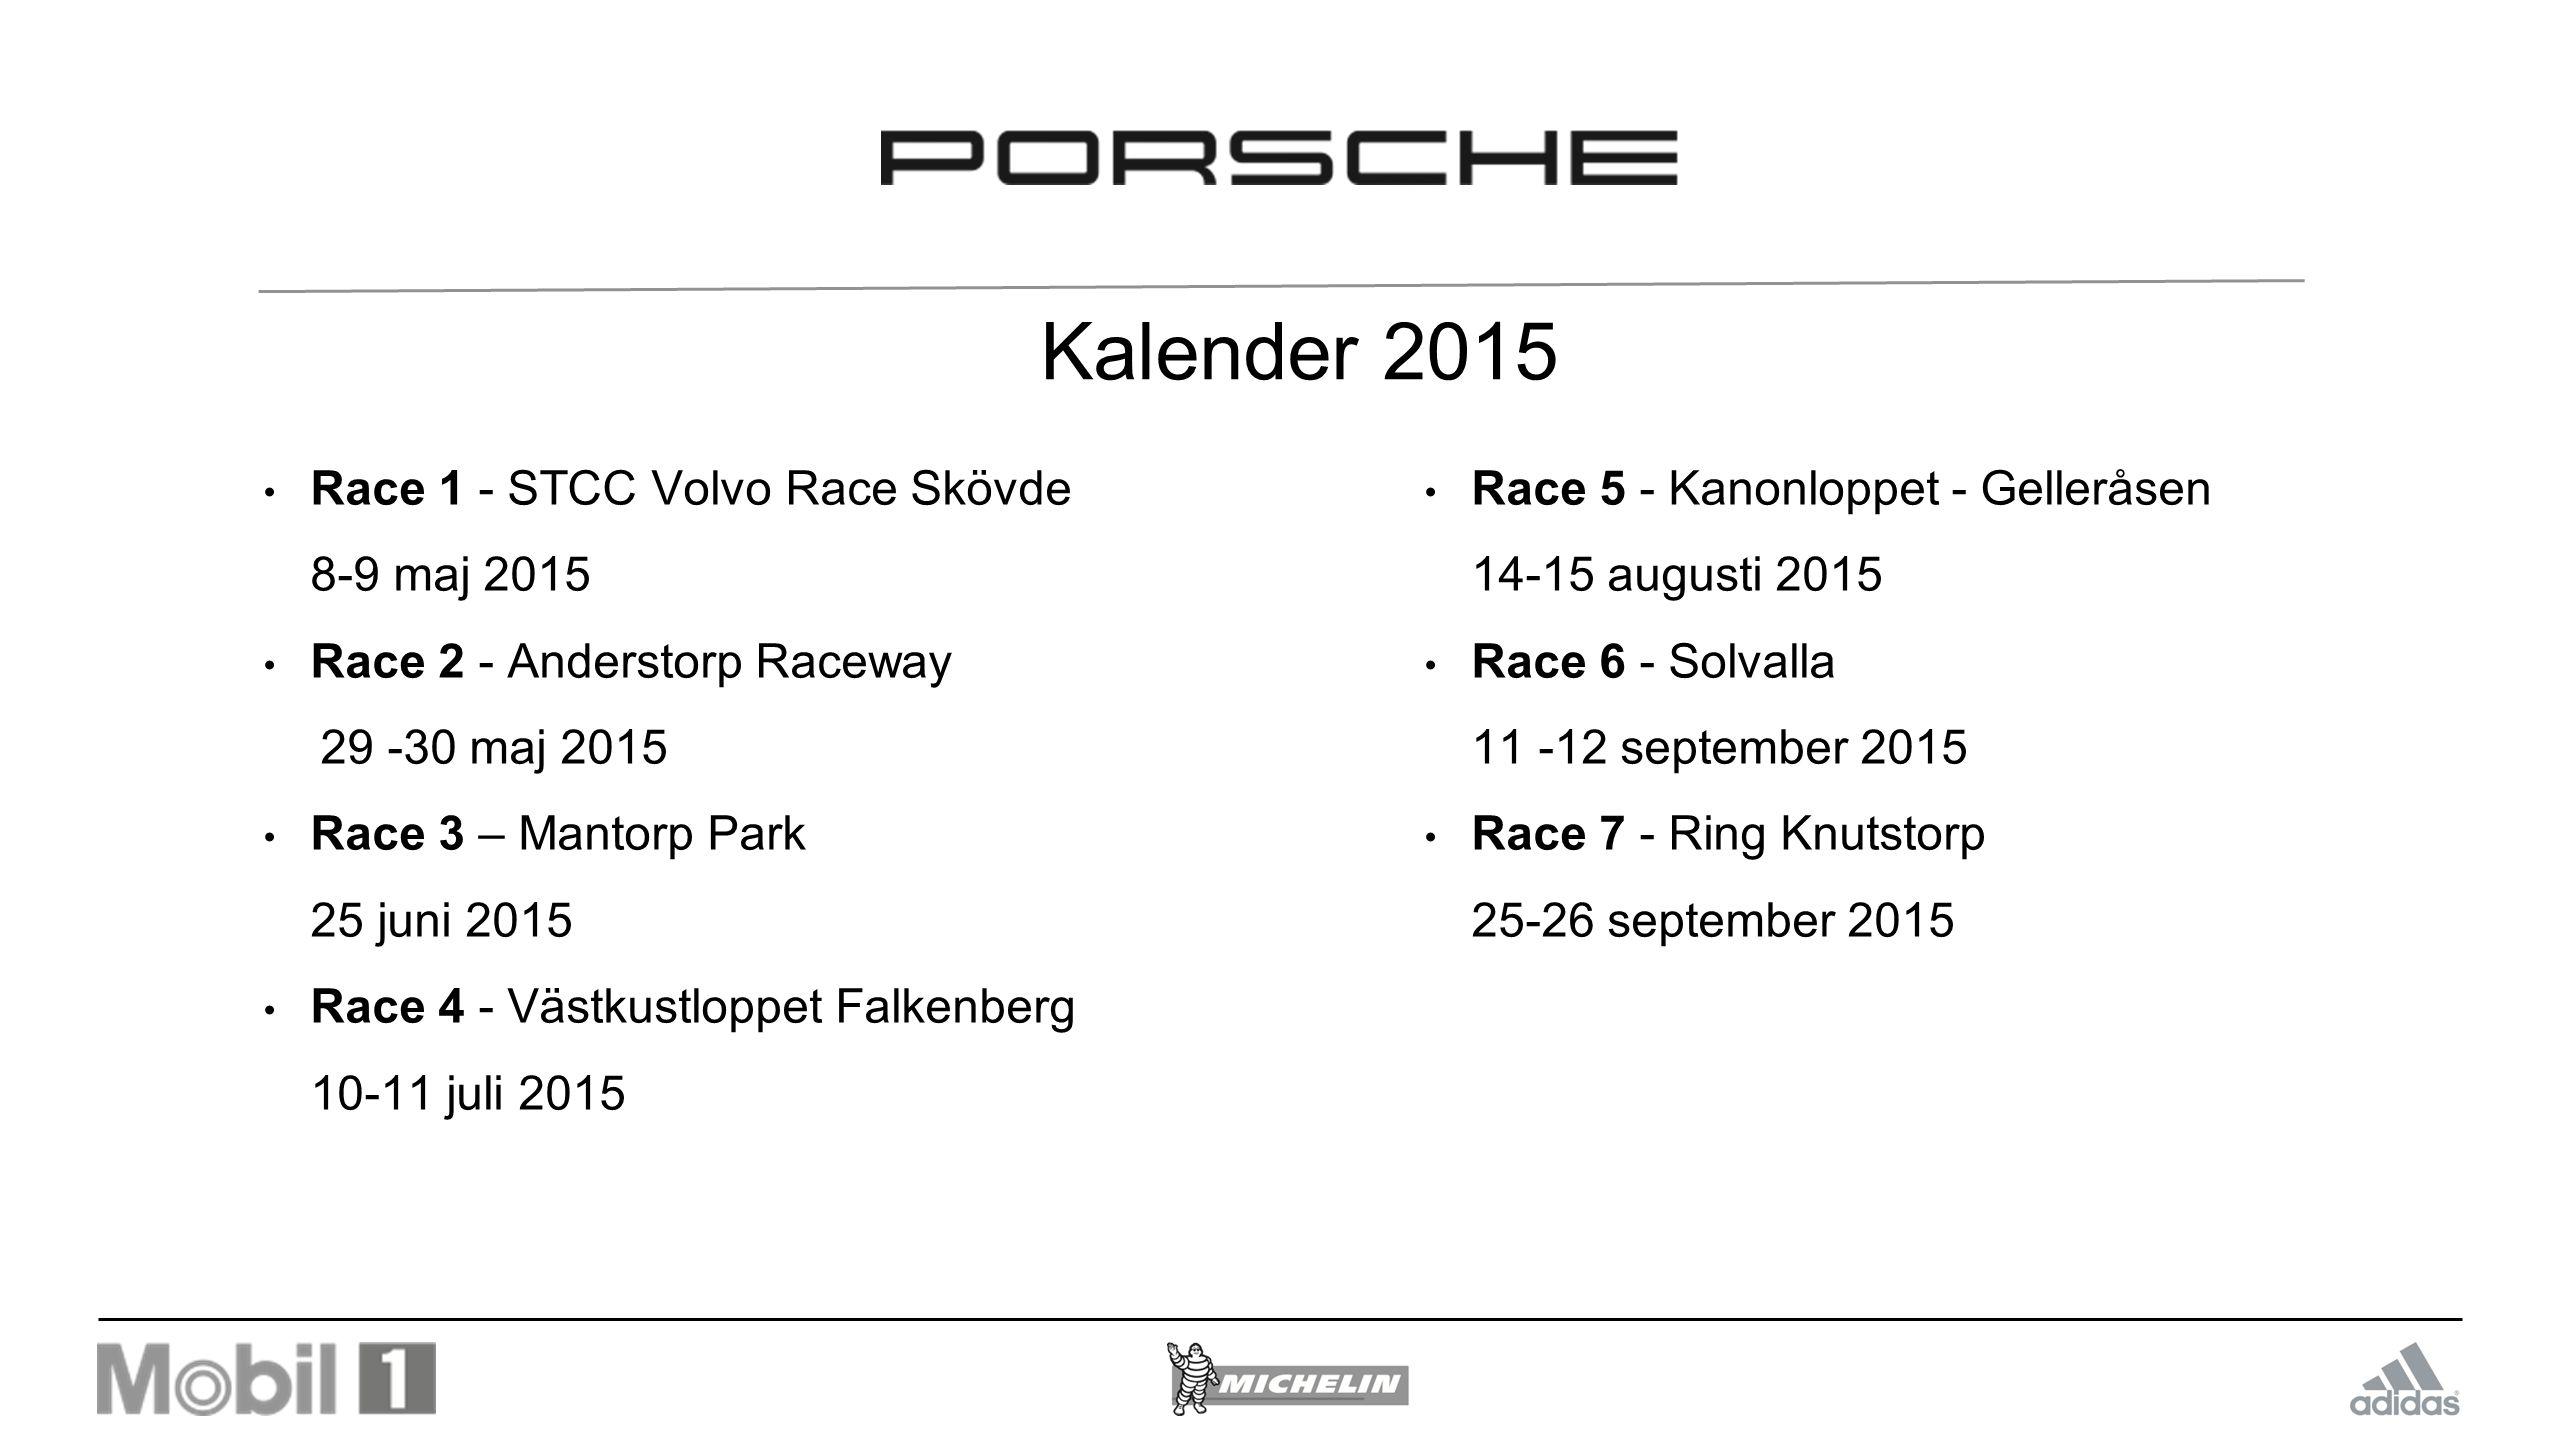 Kalender 2015 Race 1 - STCC Volvo Race Skövde 8-9 maj 2015